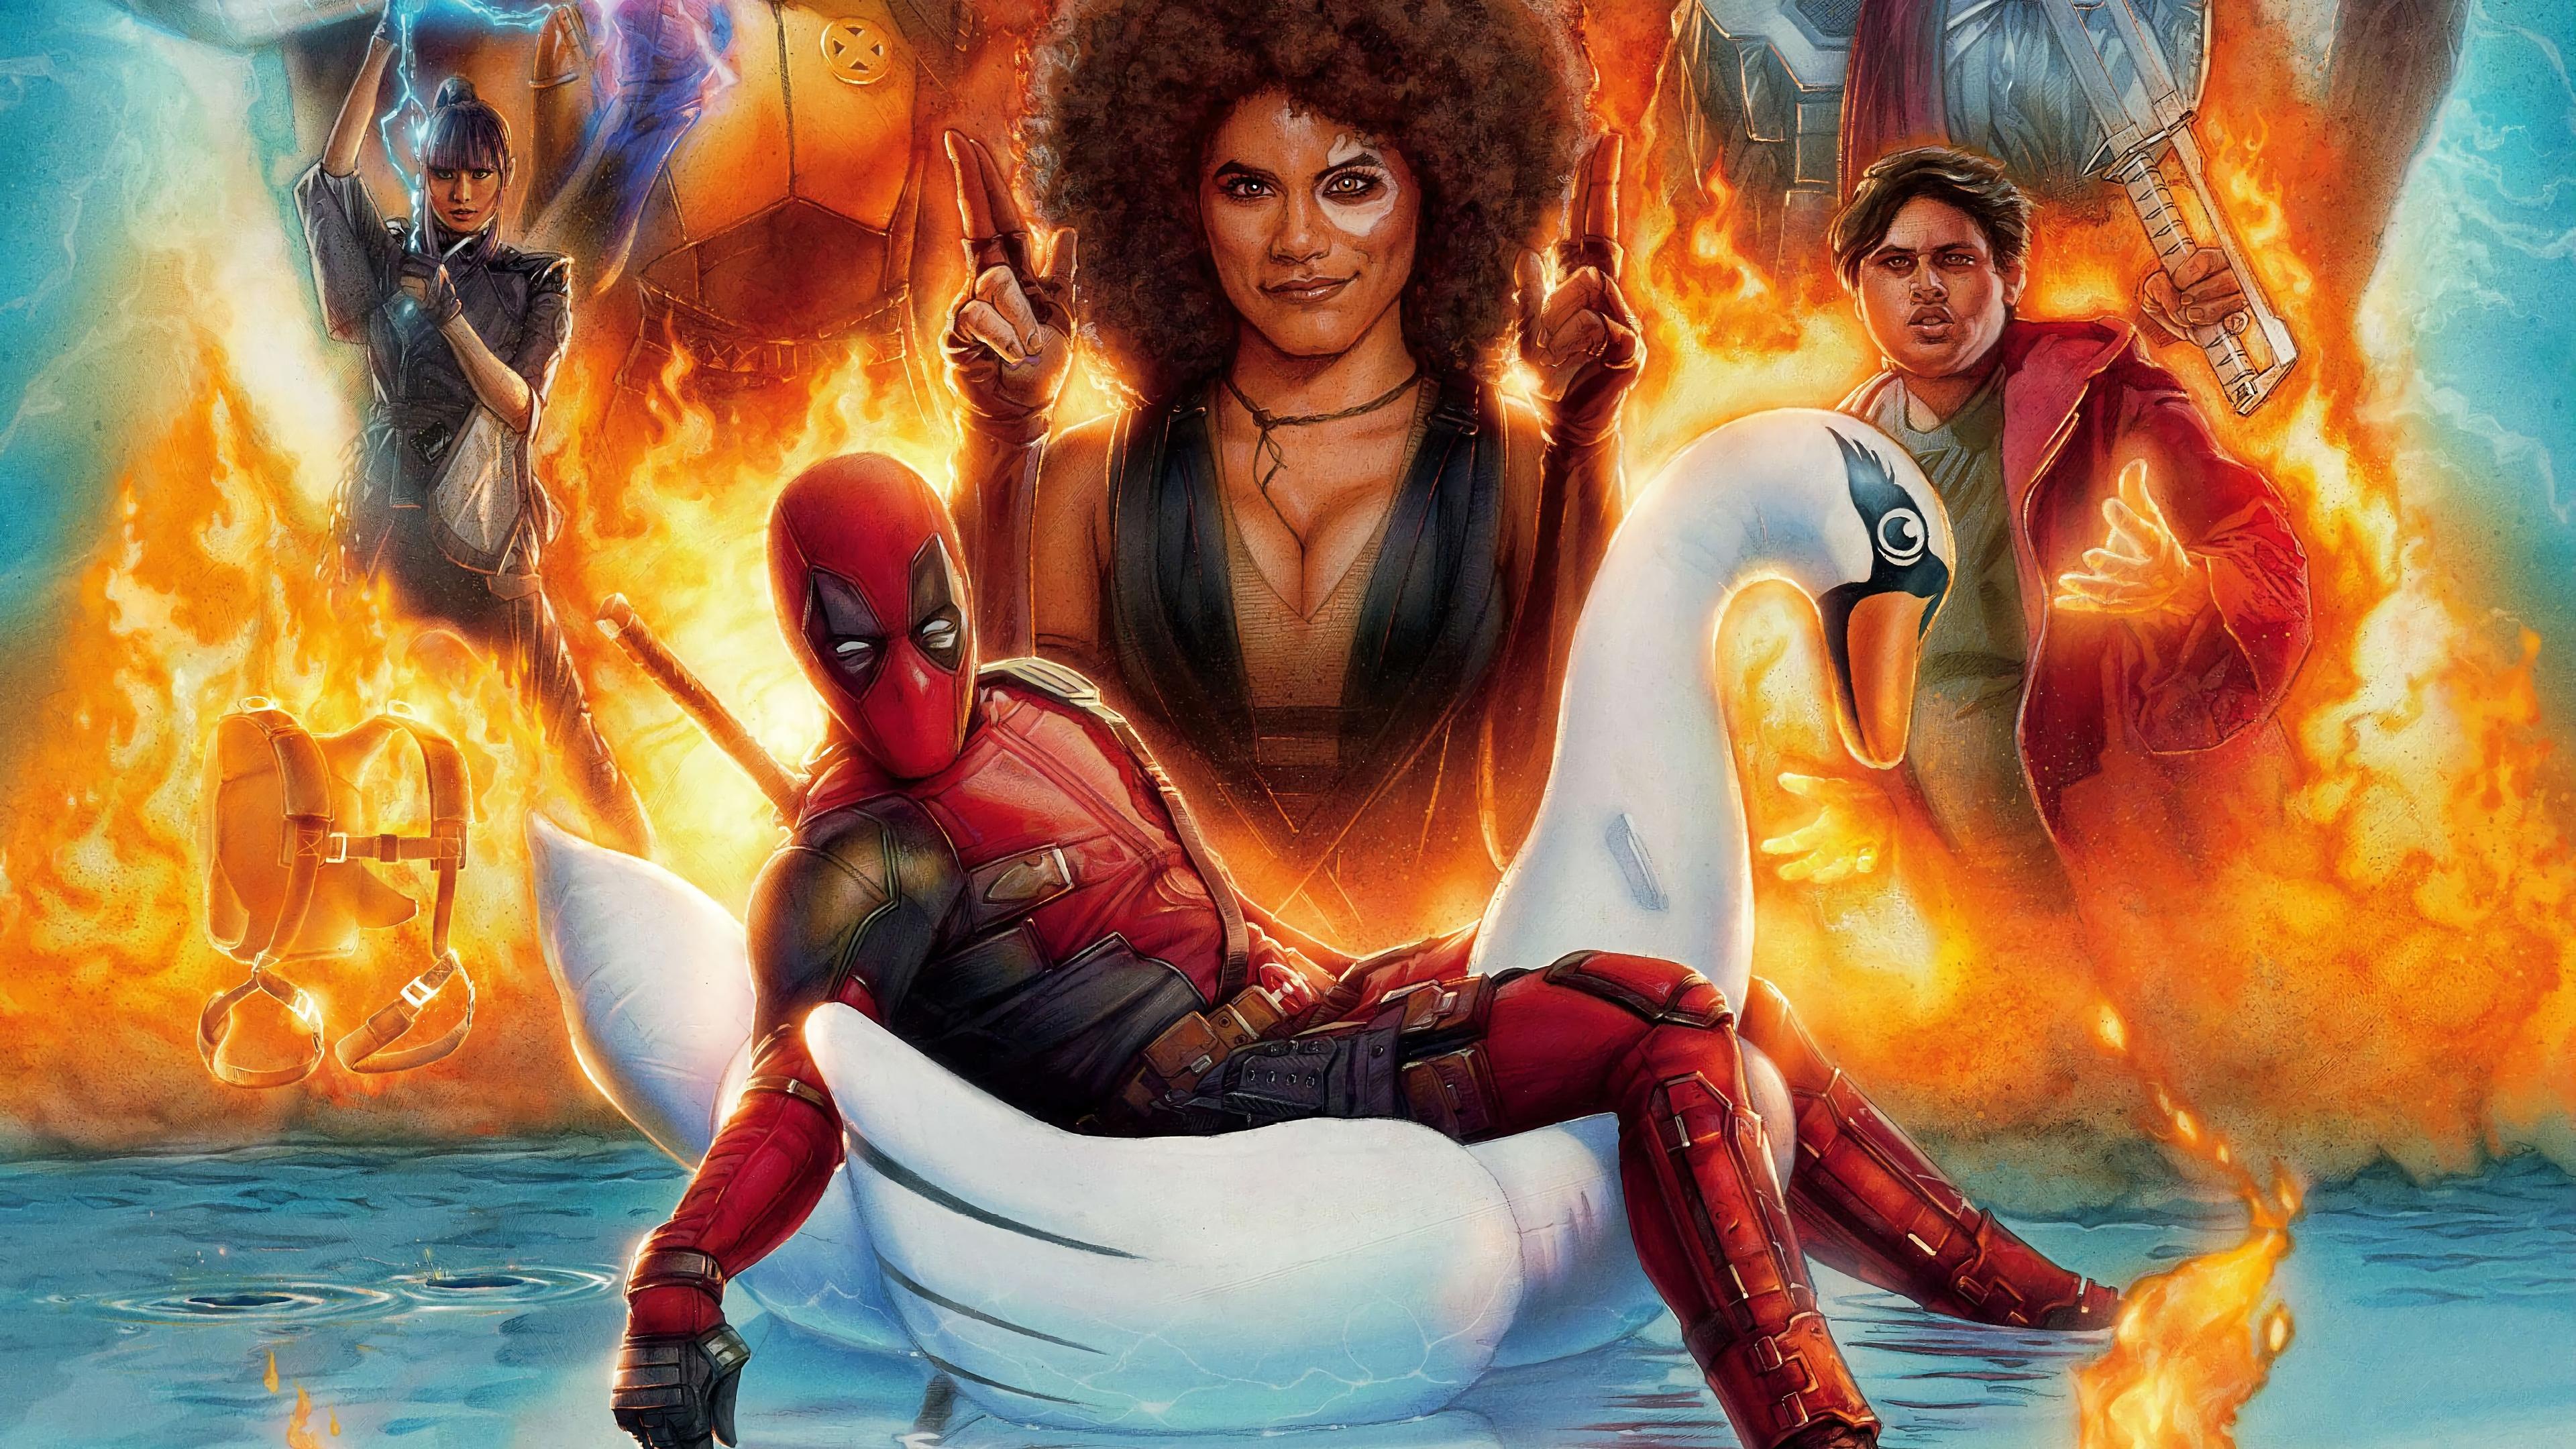 Deadpool And Domino Deadpool 2 Movie 4K Wallpaper Domino